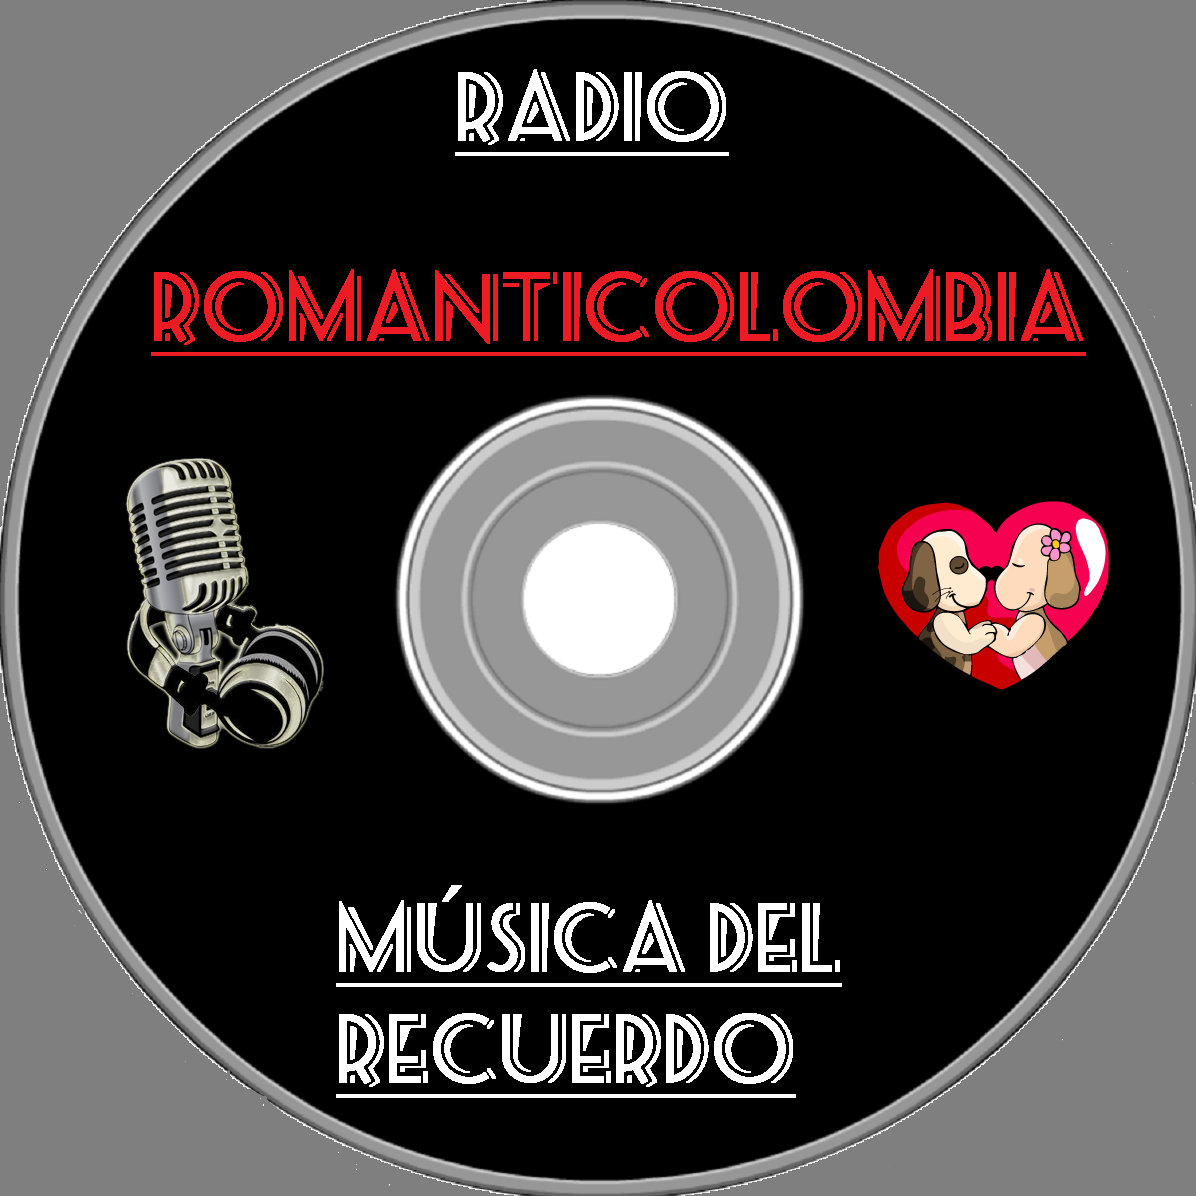 Romanticolombia